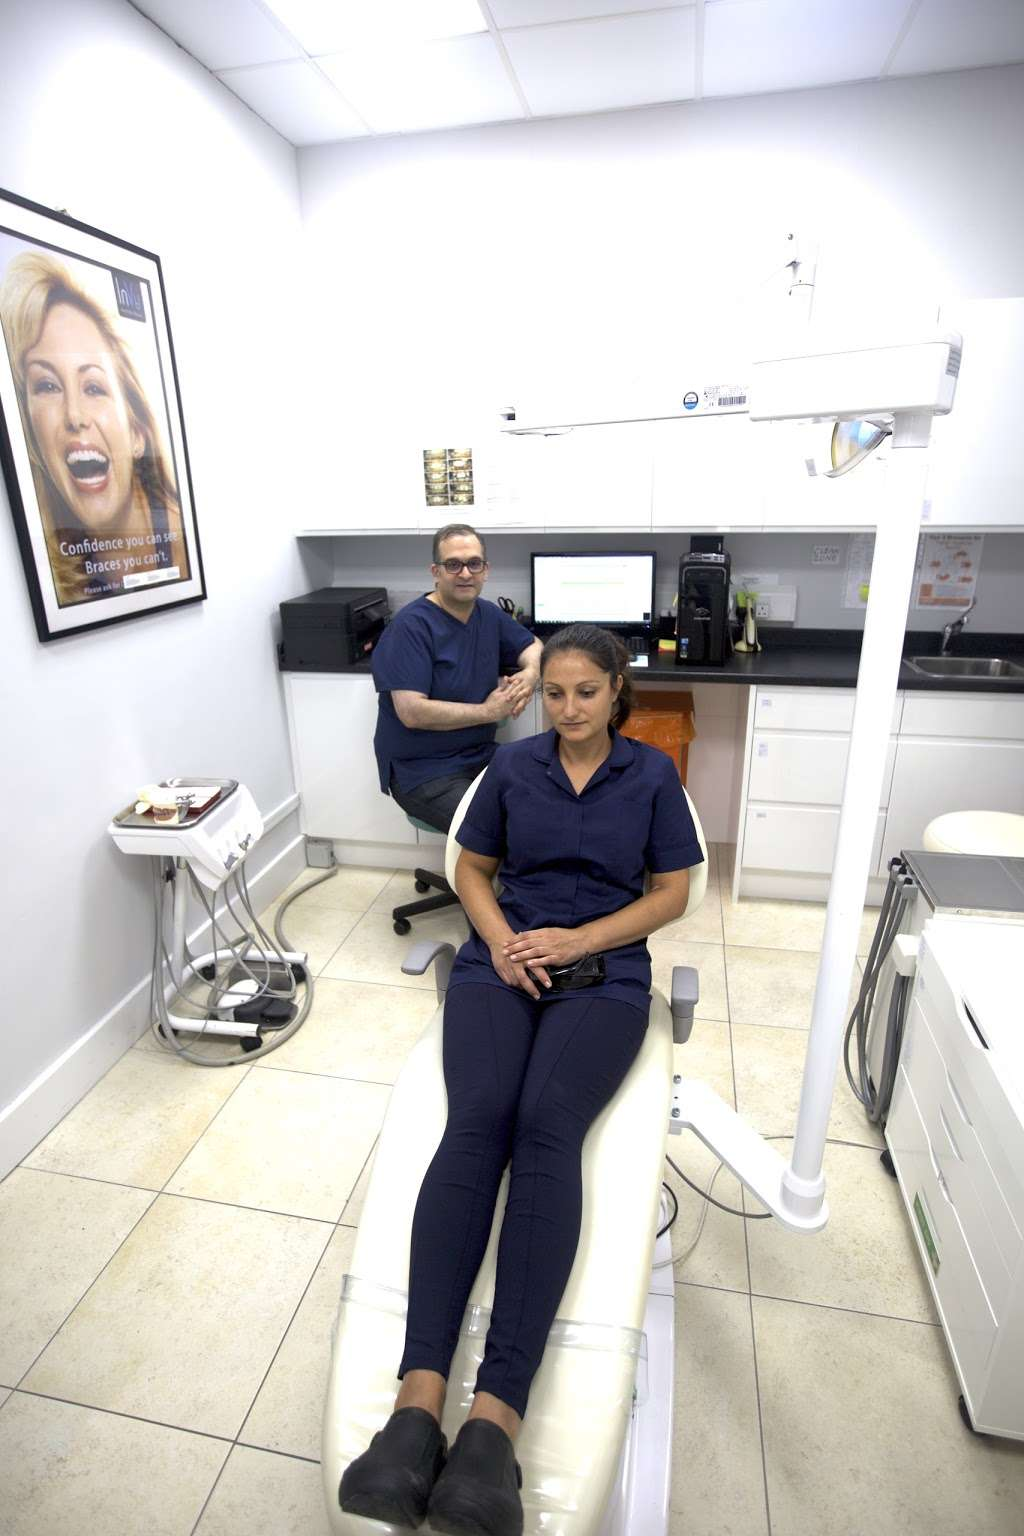 Wembley Orthodontic Centre - dentist  | Photo 6 of 10 | Address: 116 Windermere Ave, Wembley HA9 8RB, UK | Phone: 020 8904 5075